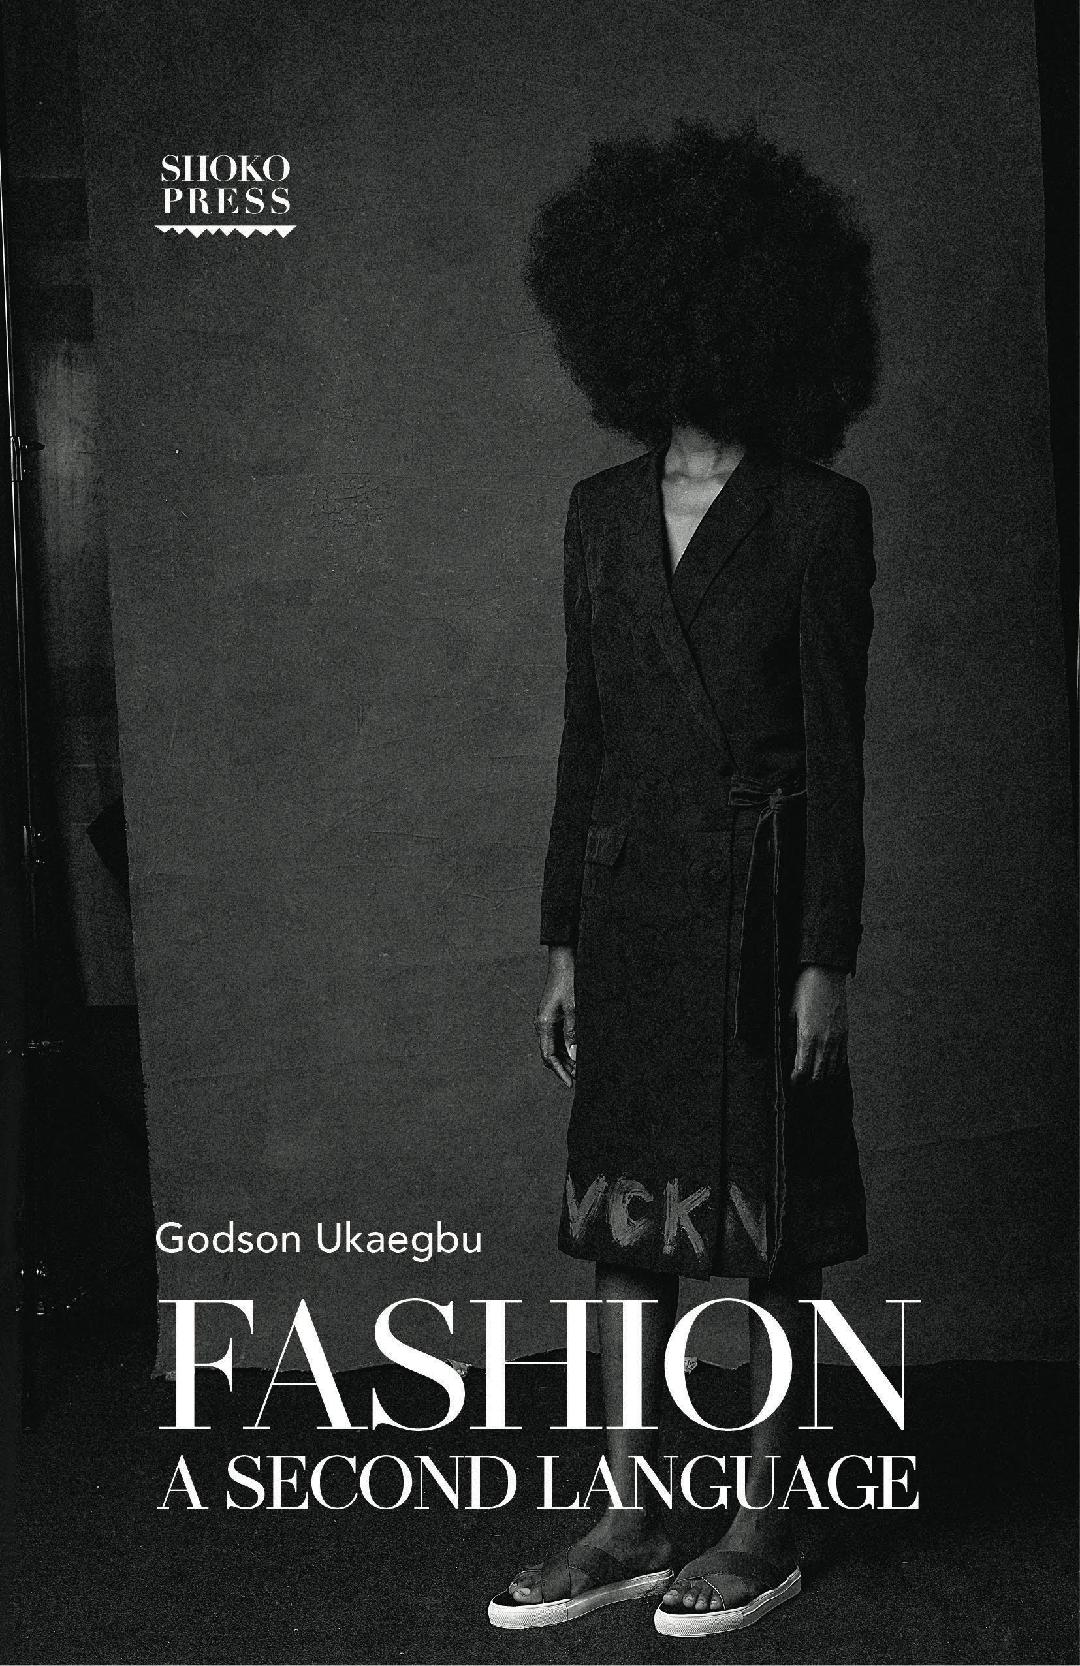 godson-ukaegbu-fashion-a-second-language